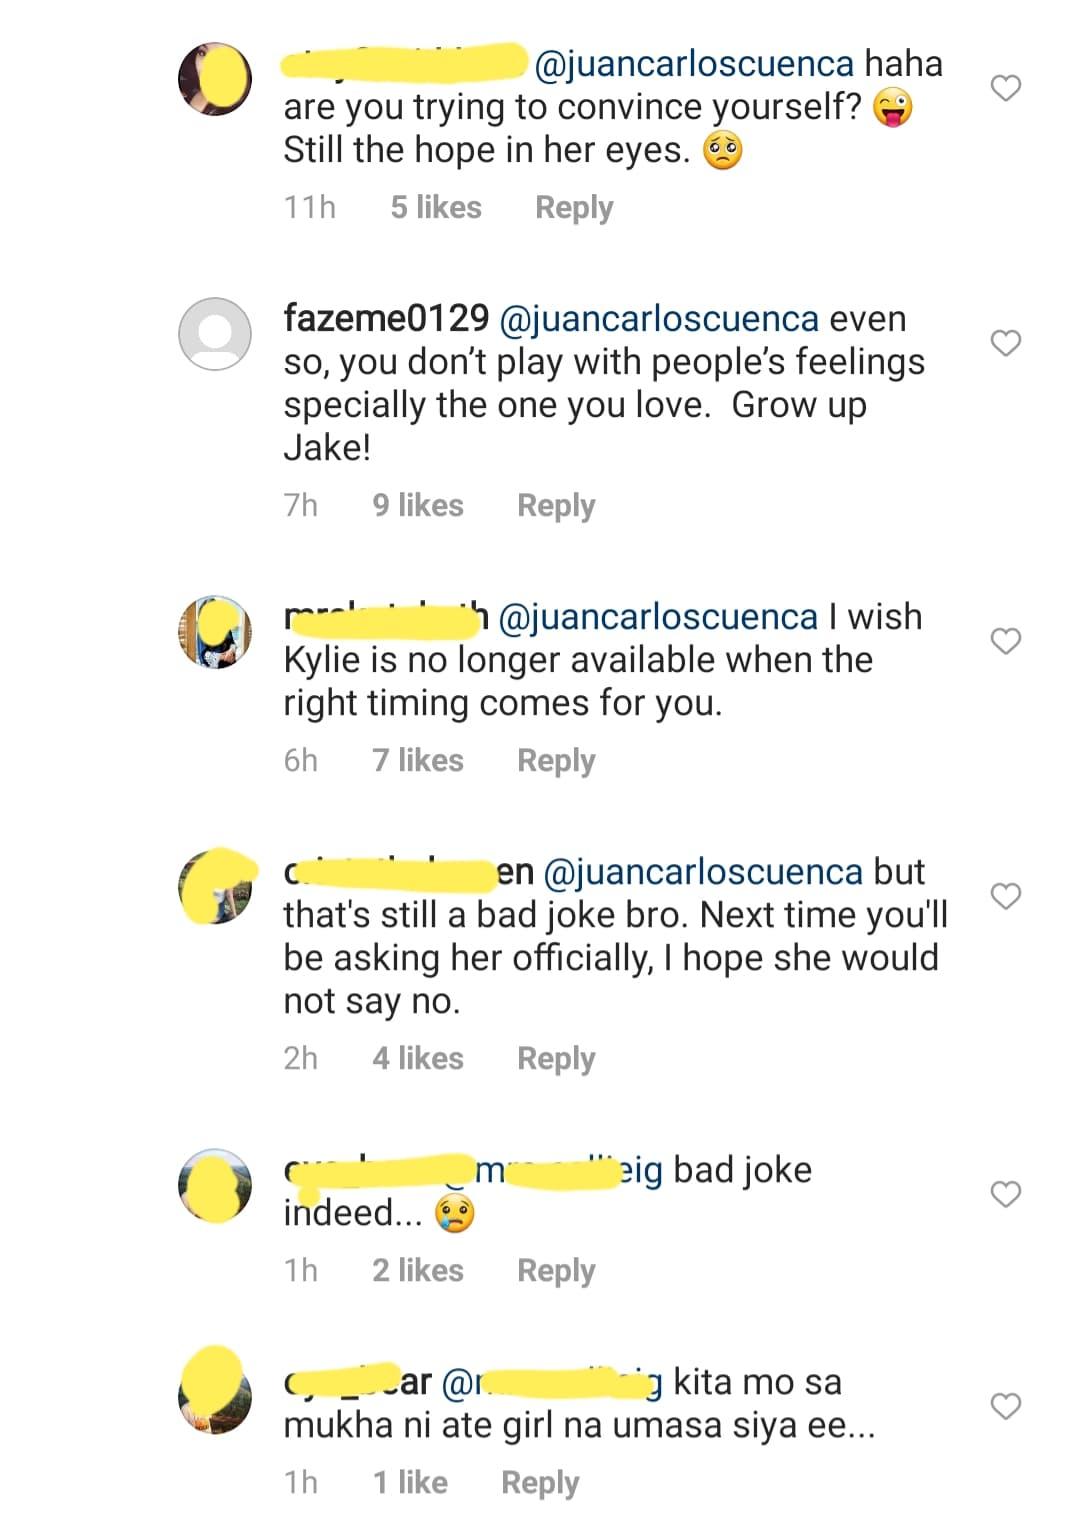 Netizens claim that Jake toyed Kylie feelings